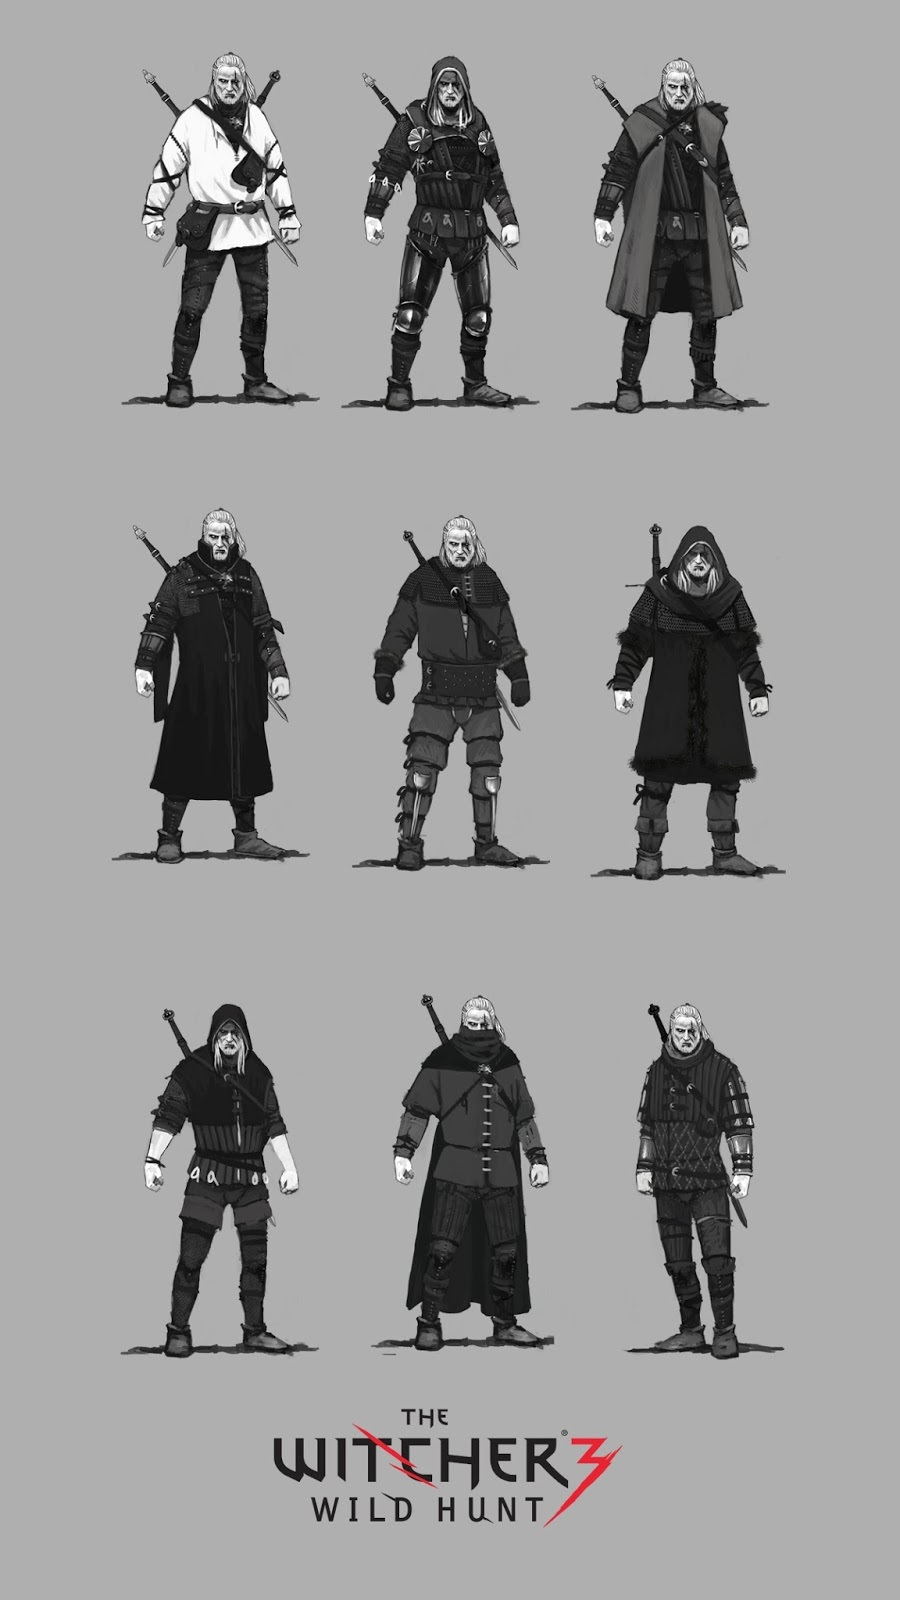 The-Witcher-3-Wild-Hunt-1391243168787092